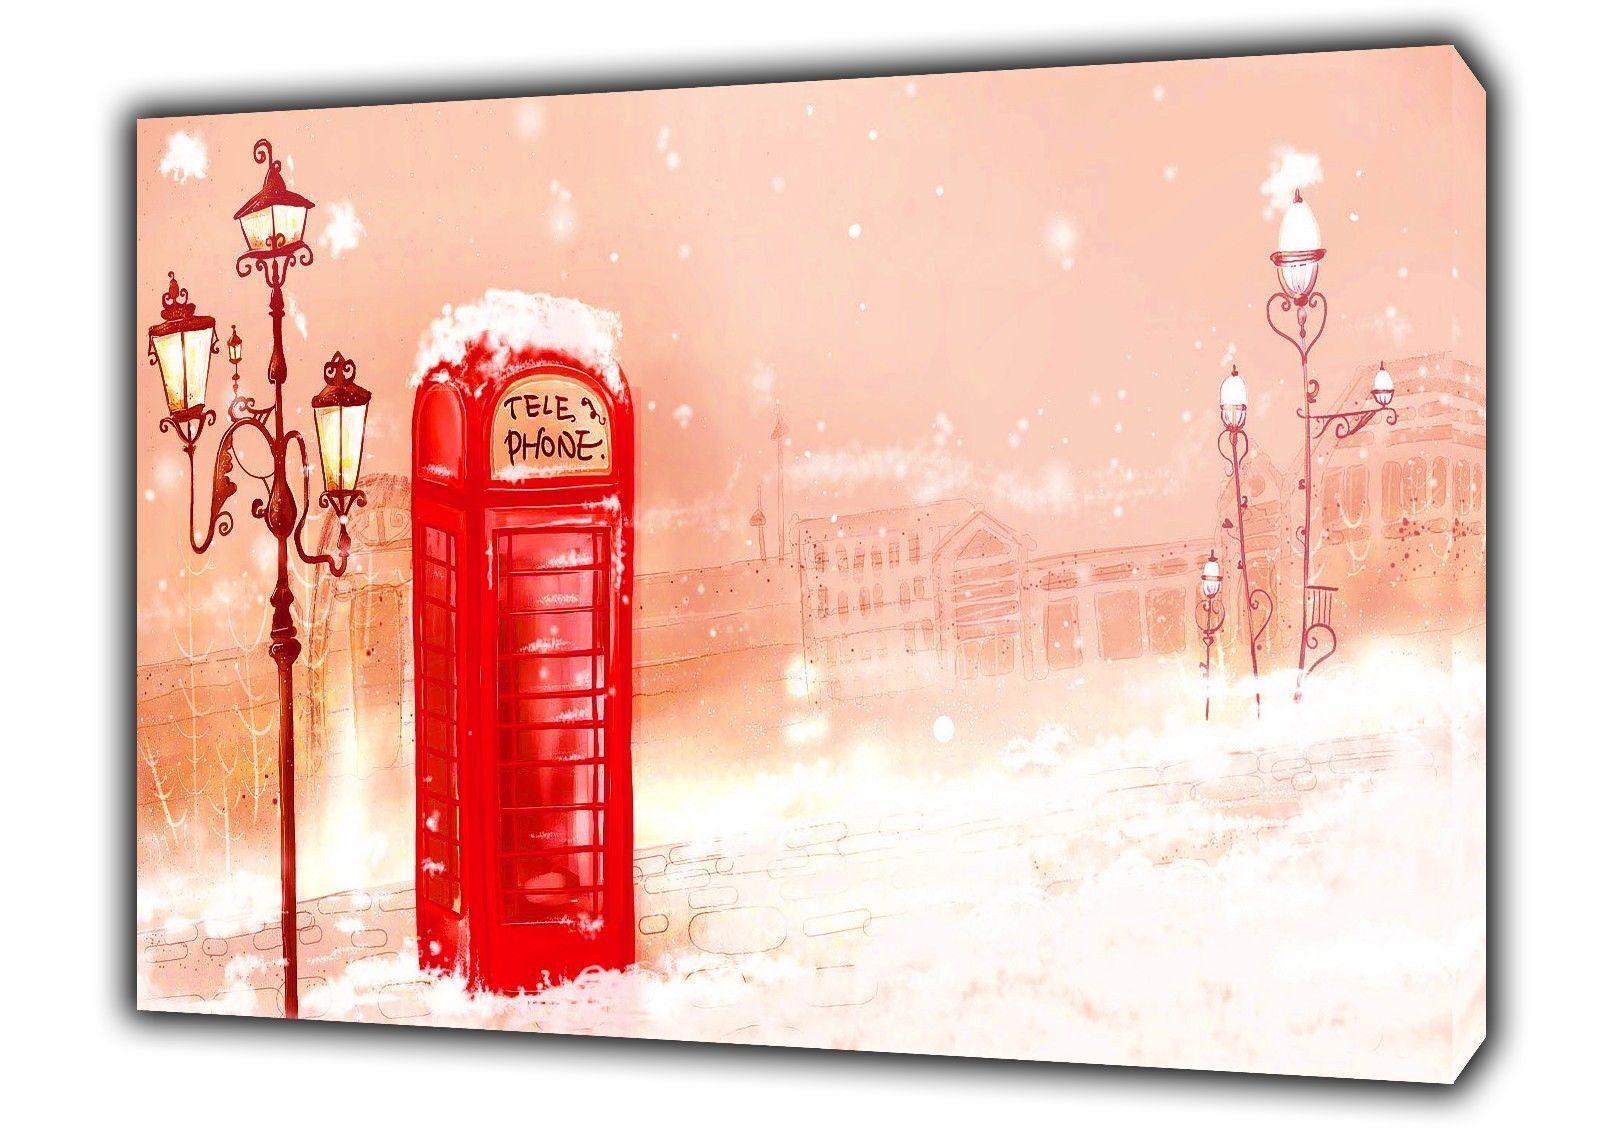 LONDON WINTER SNOW rot PHONE BOX PRINT ON WOOD FRAMED CANVAS WALL ART DECOR